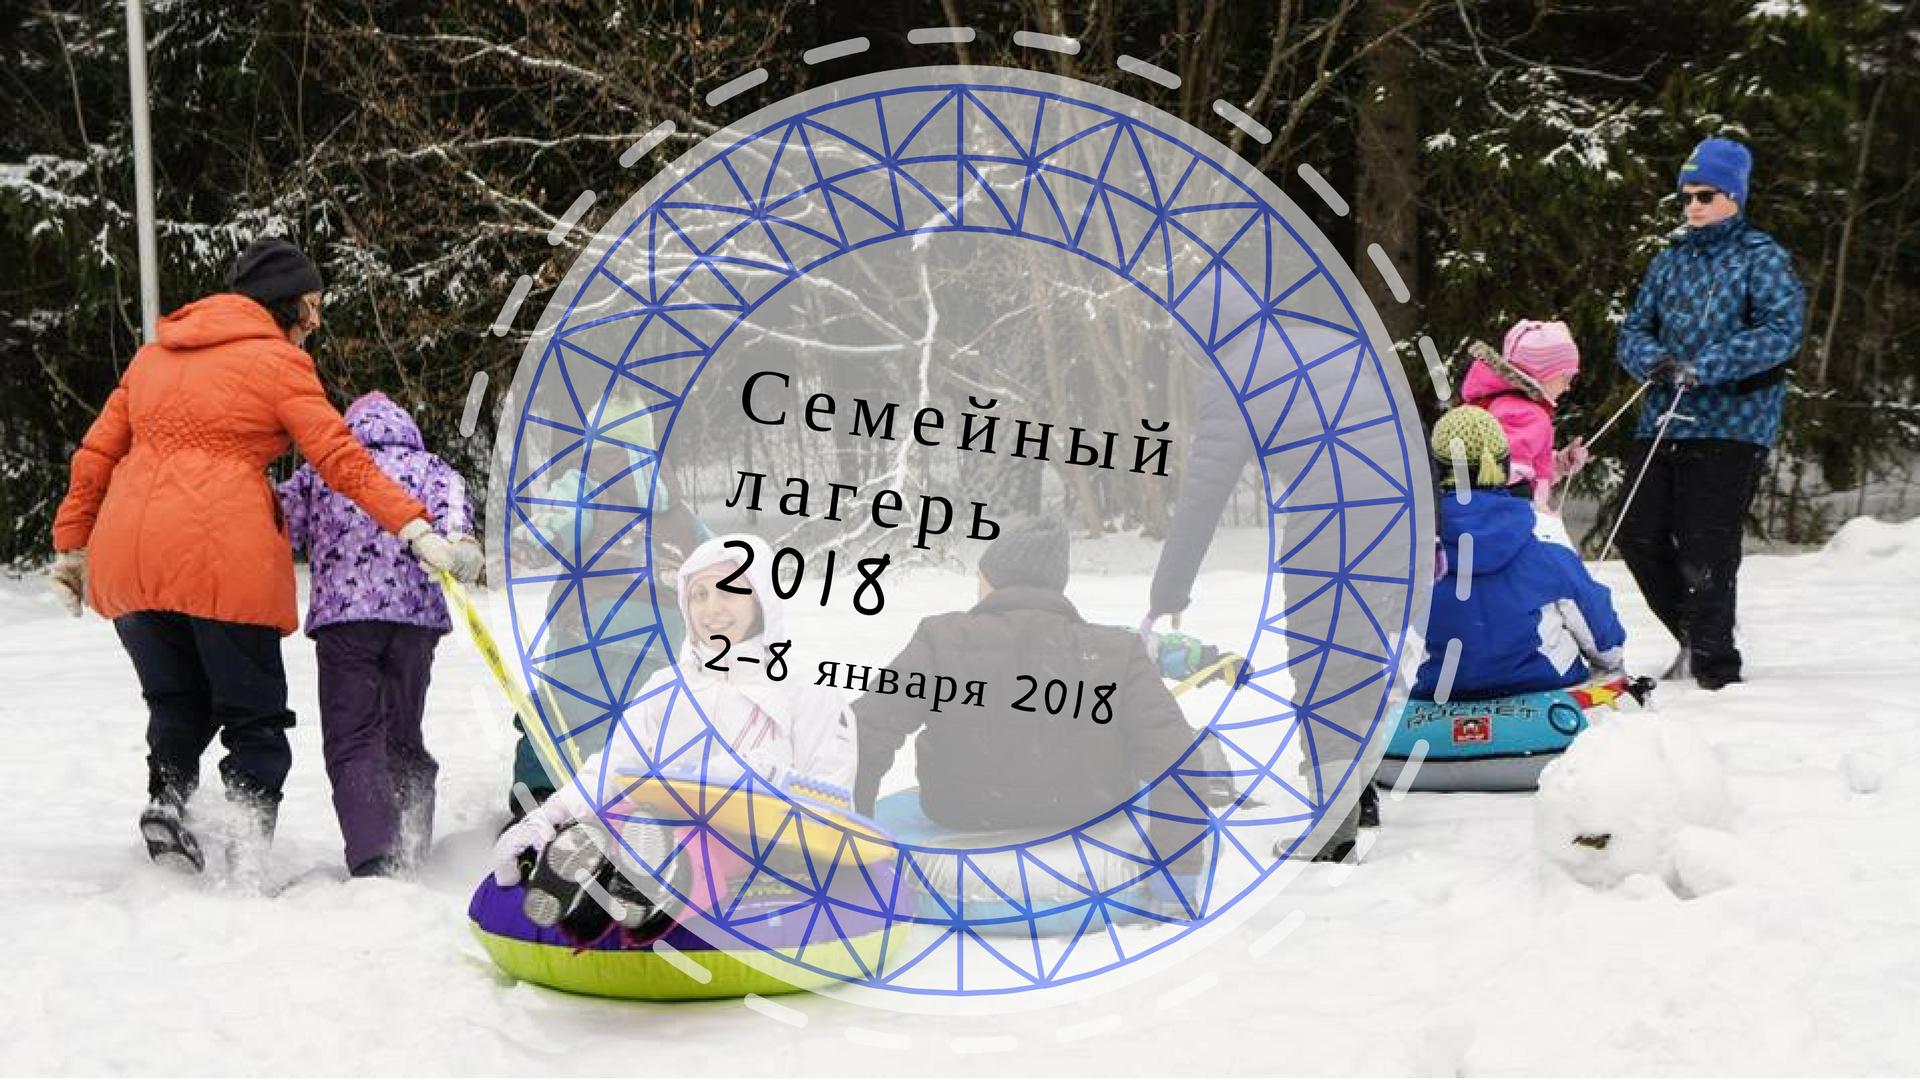 Semejnyj-lager-2018